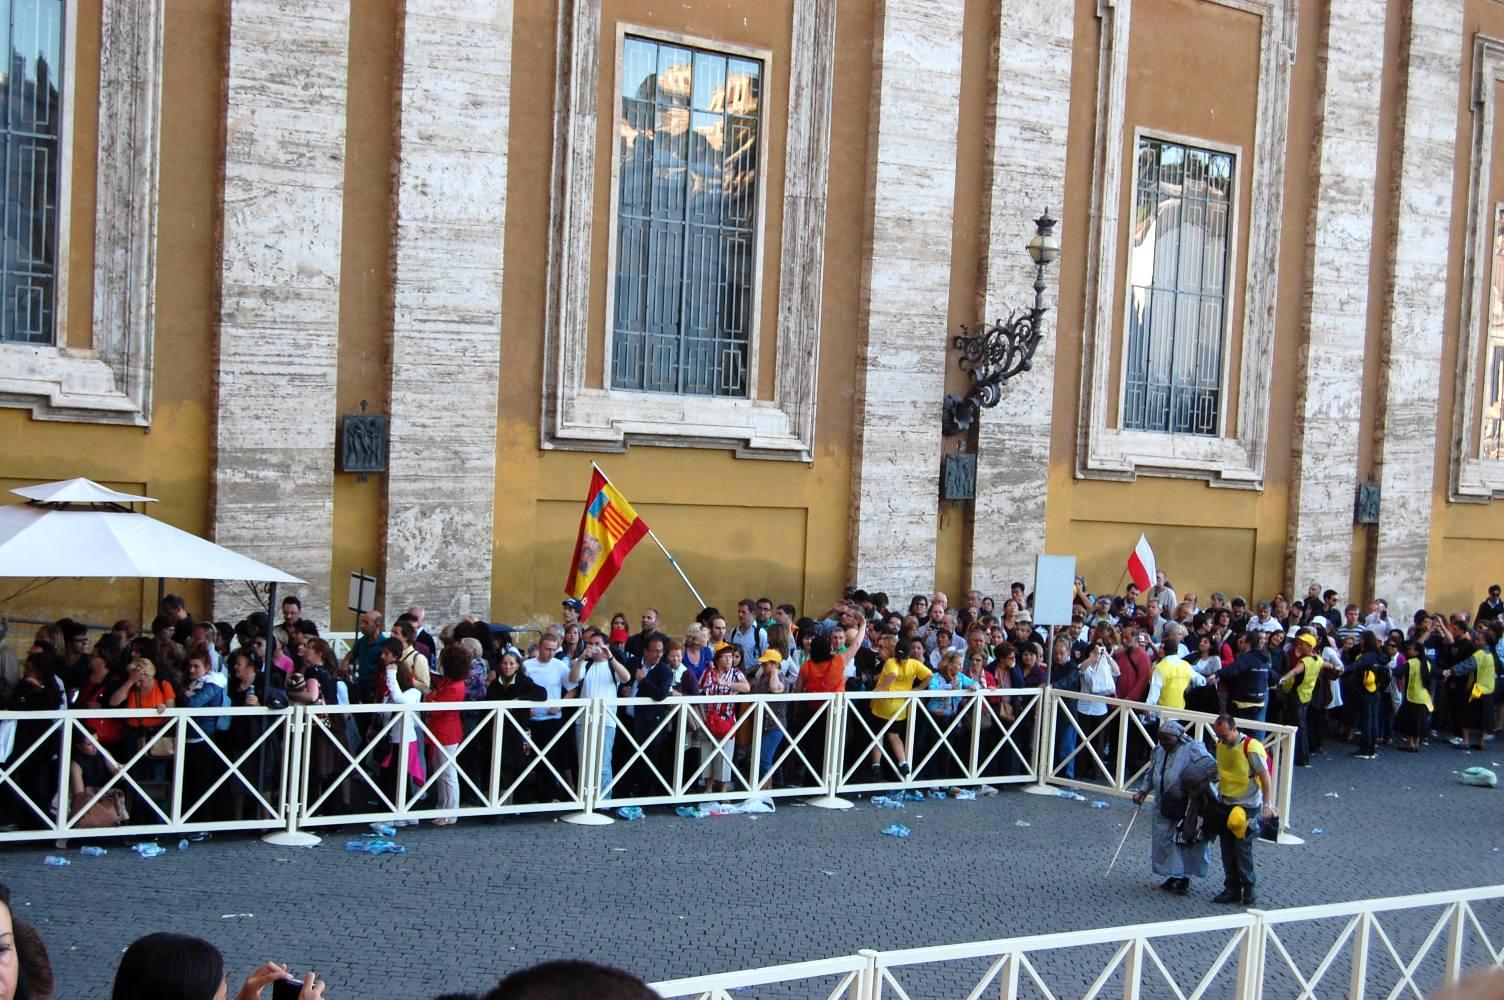 beatificacion_JPII_01_05_2011_128